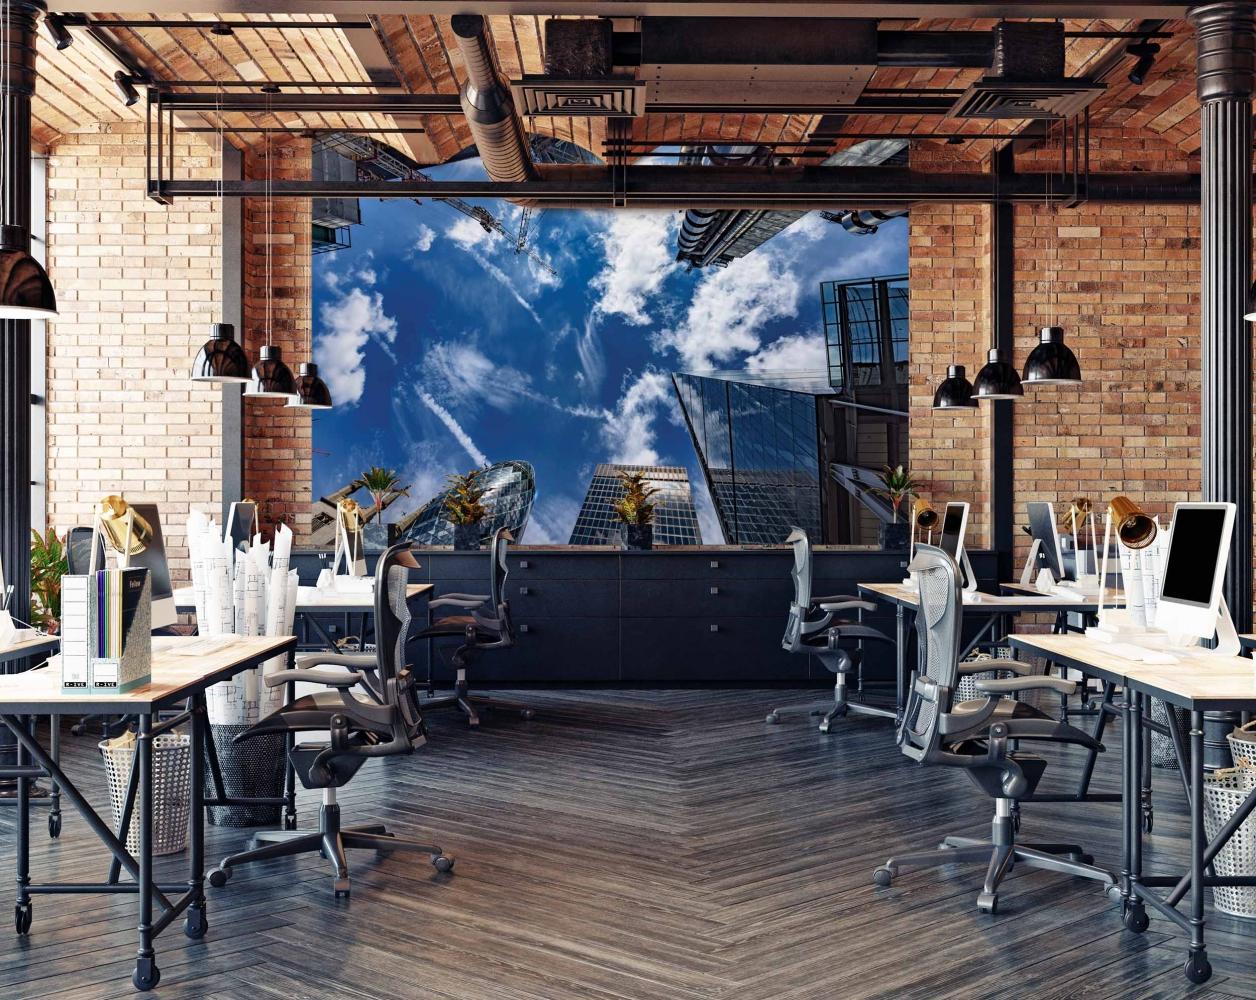 Tapeta Mrakodrapy Londýn, 216 x 140 cm